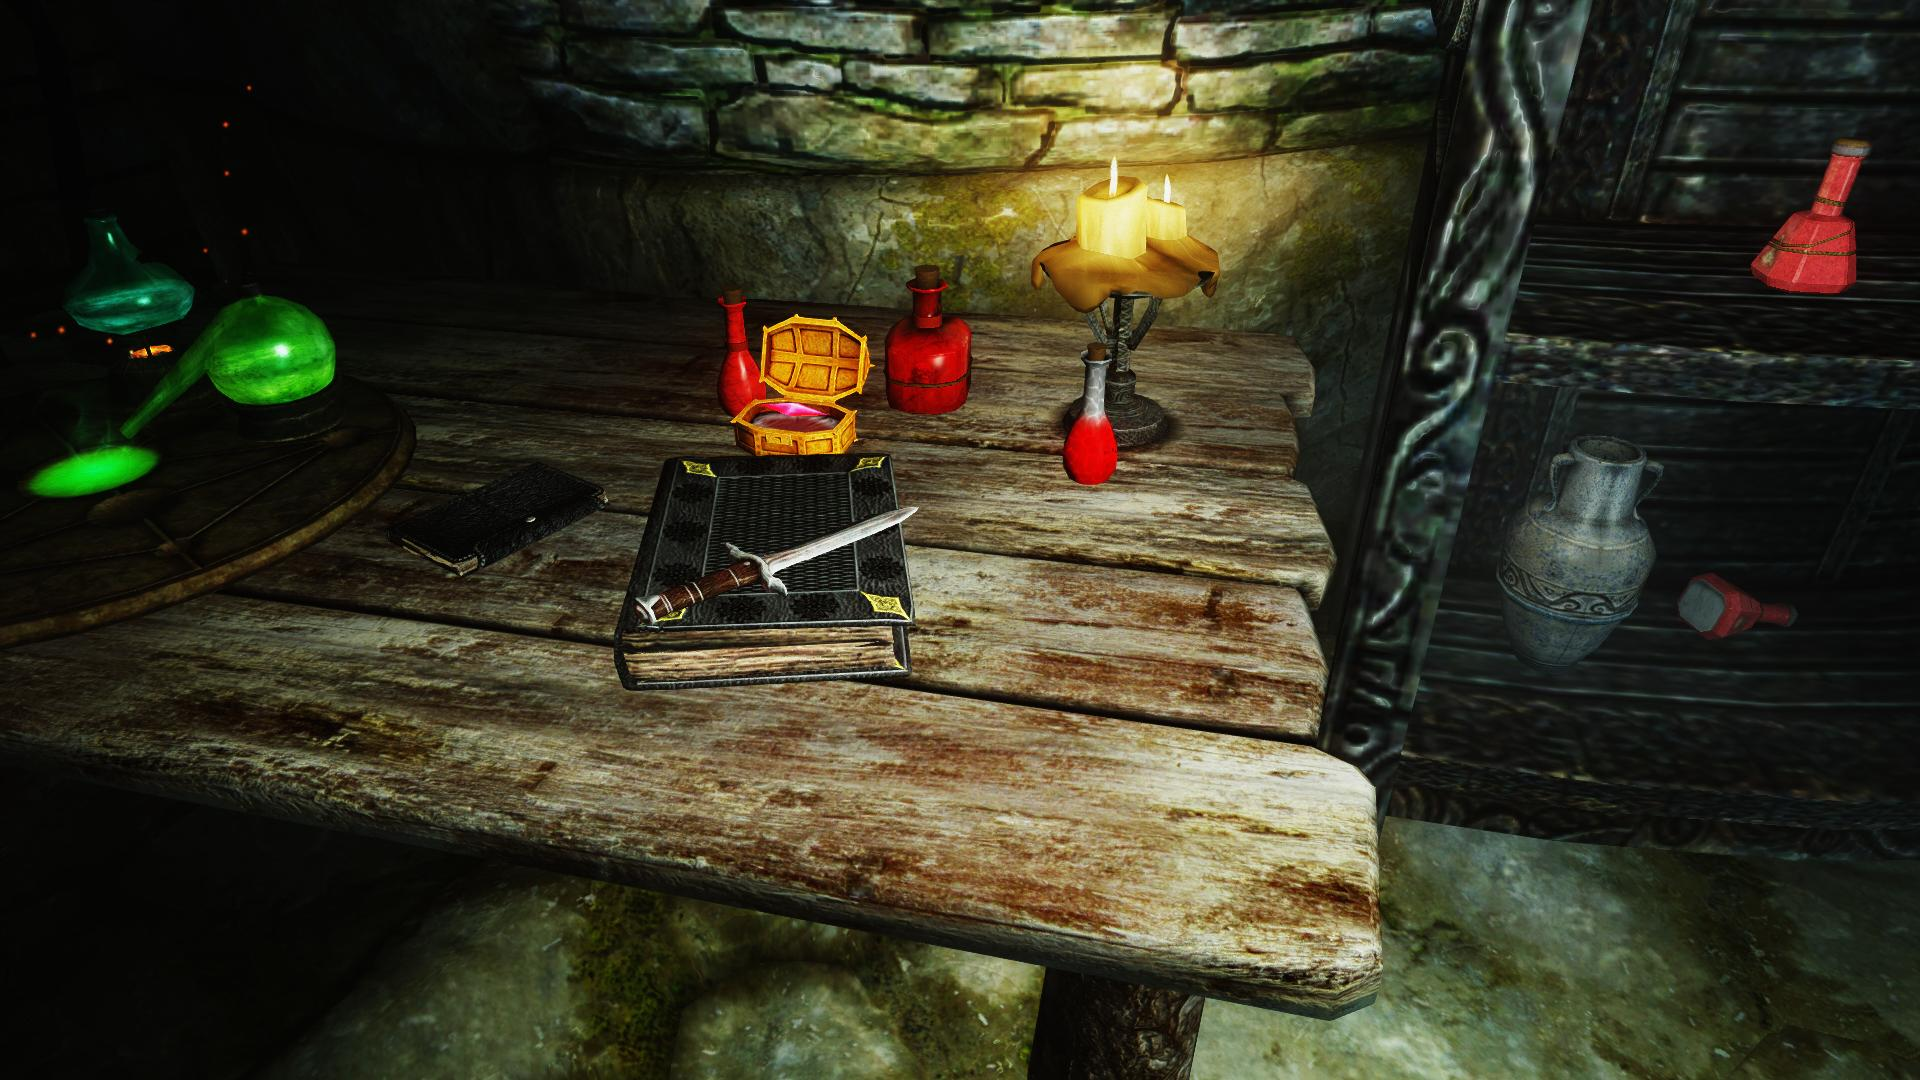 000764.Jpg - Elder Scrolls 5: Skyrim, the